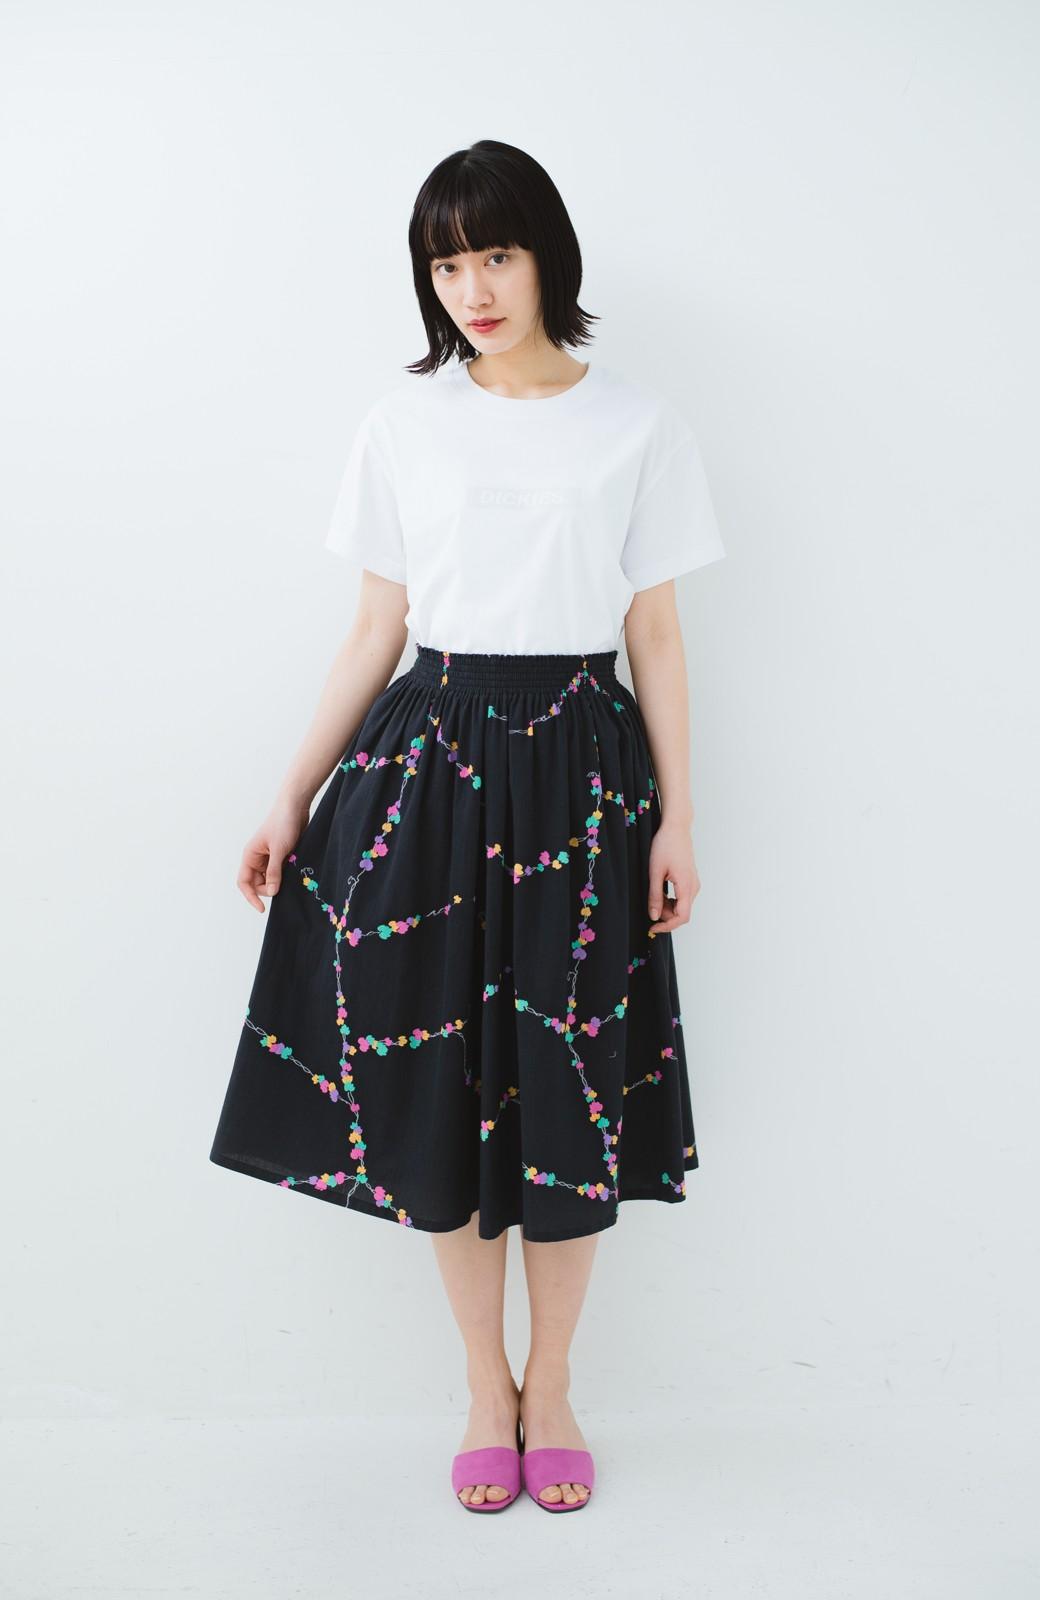 haco! 京都の浴衣屋さんと作った浴衣生地のスカート <ブラック系その他>の商品写真11